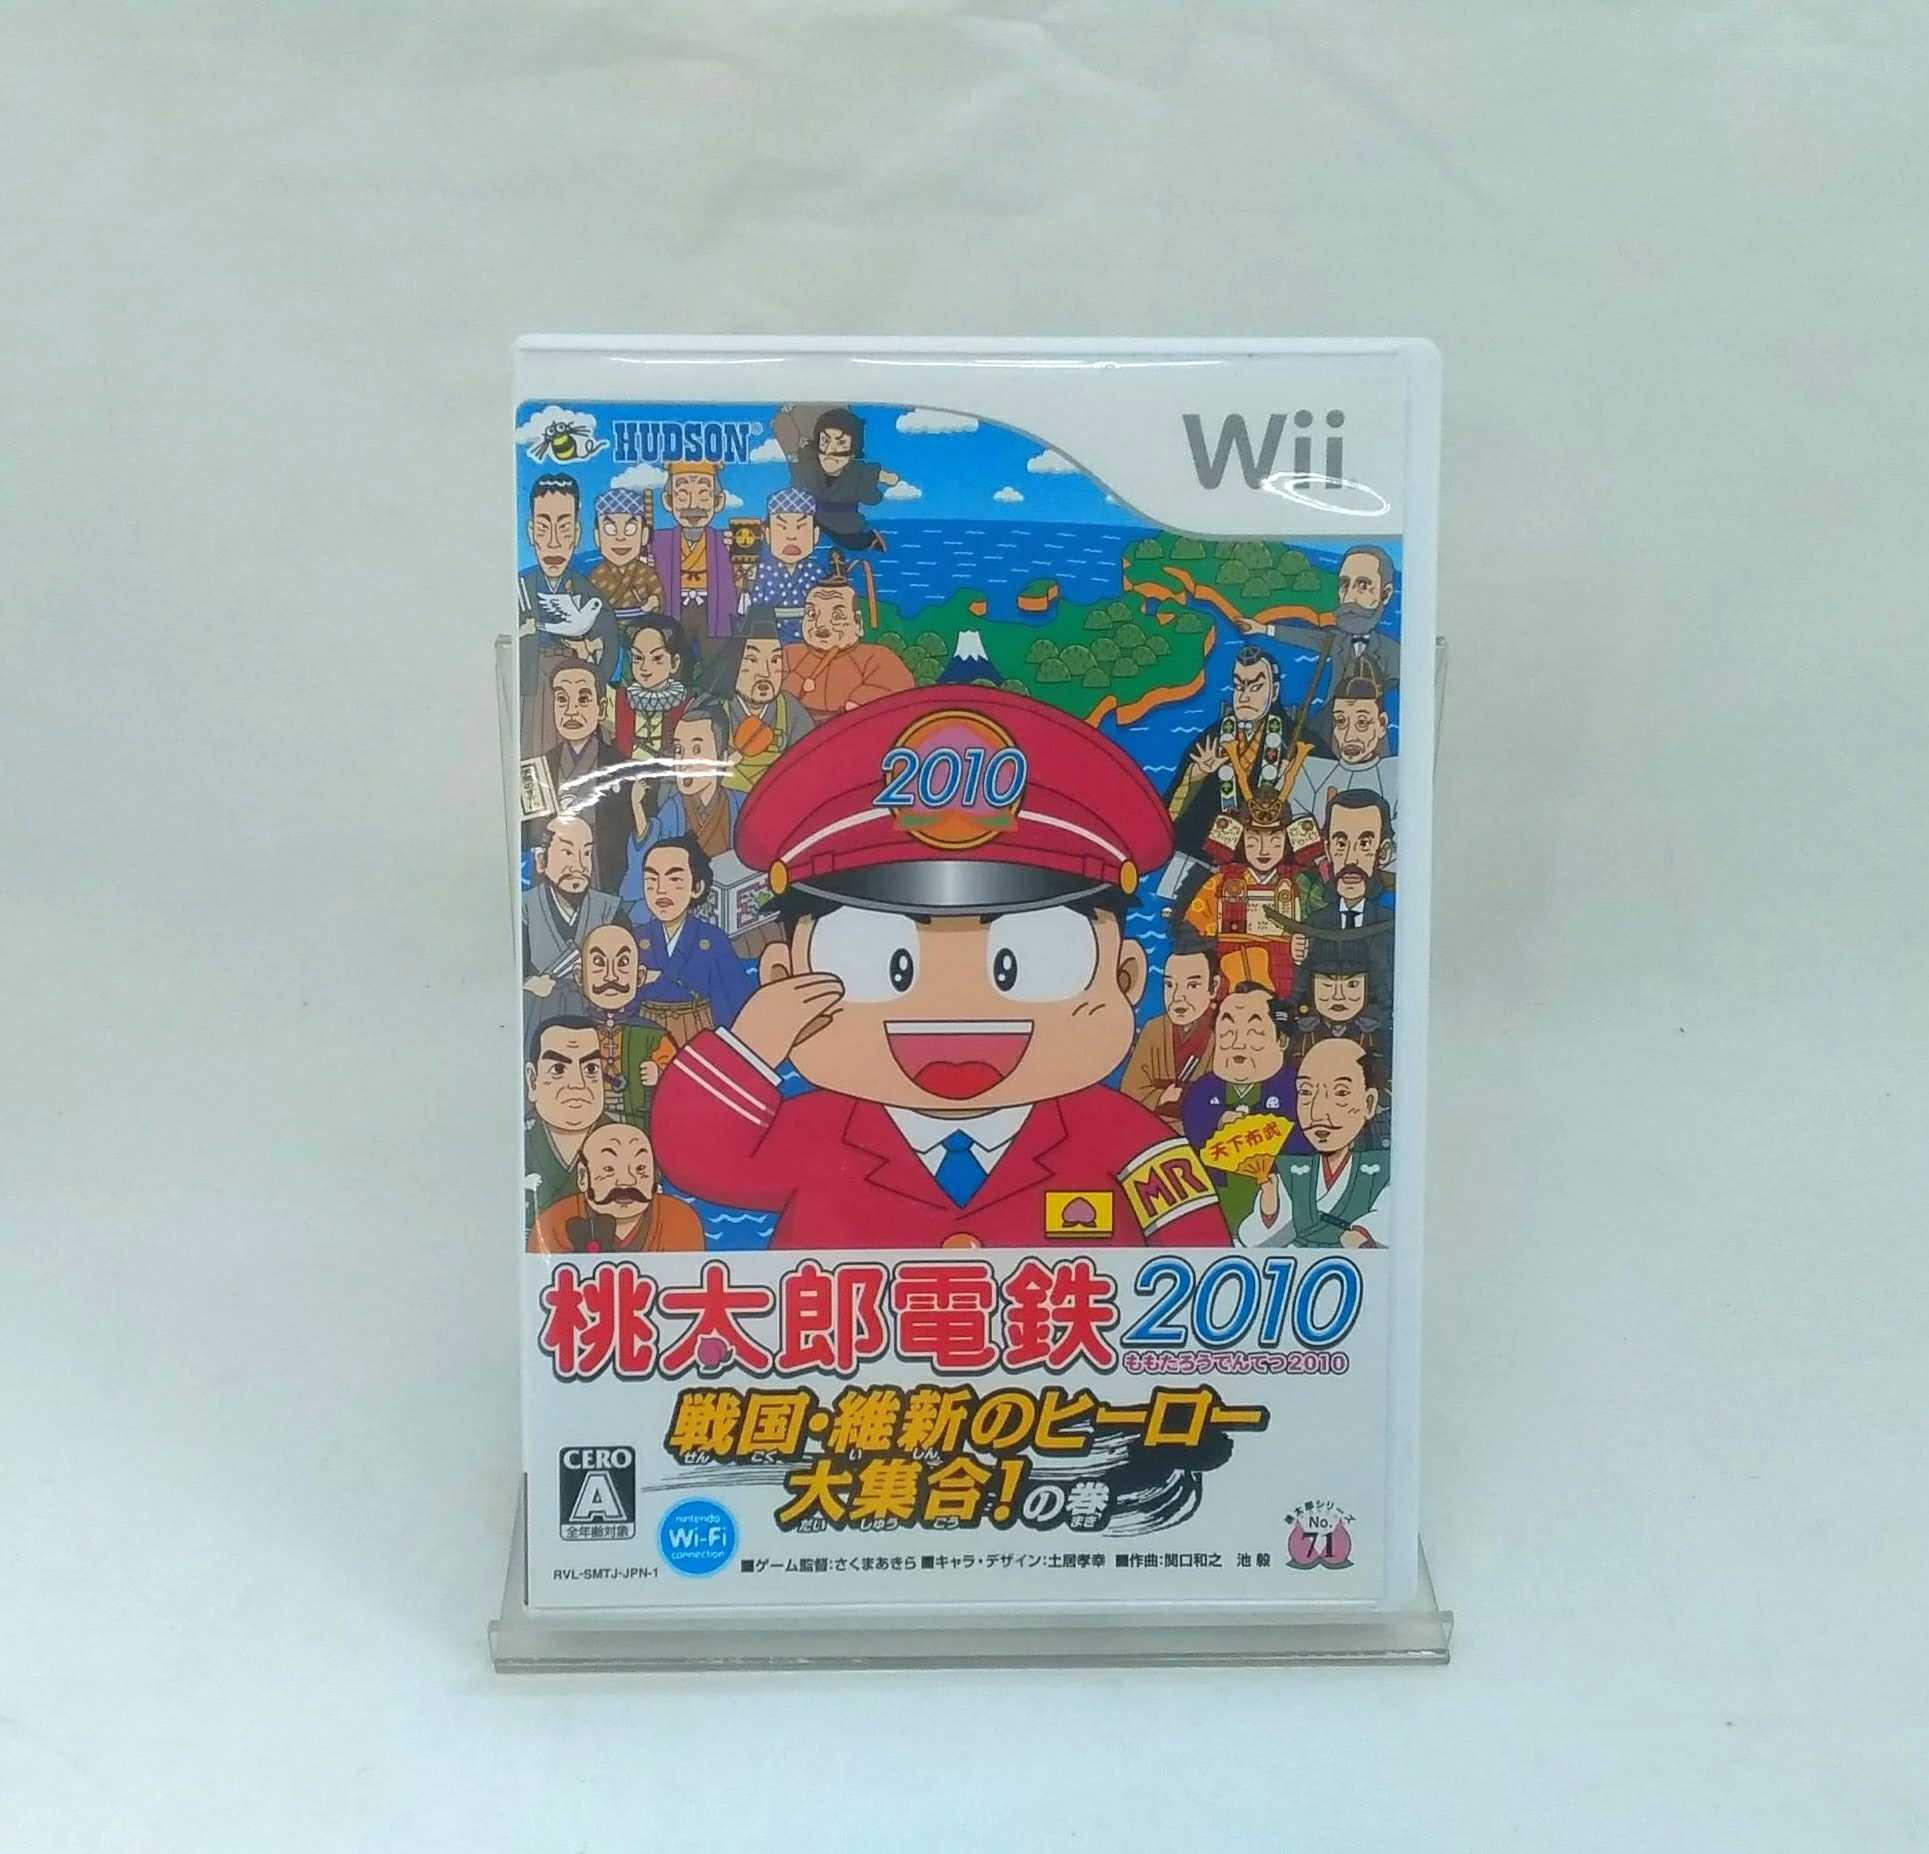 Wiiソフト 桃太郎電鉄2010 戦国・維新のヒーロー大集合 HUDSON